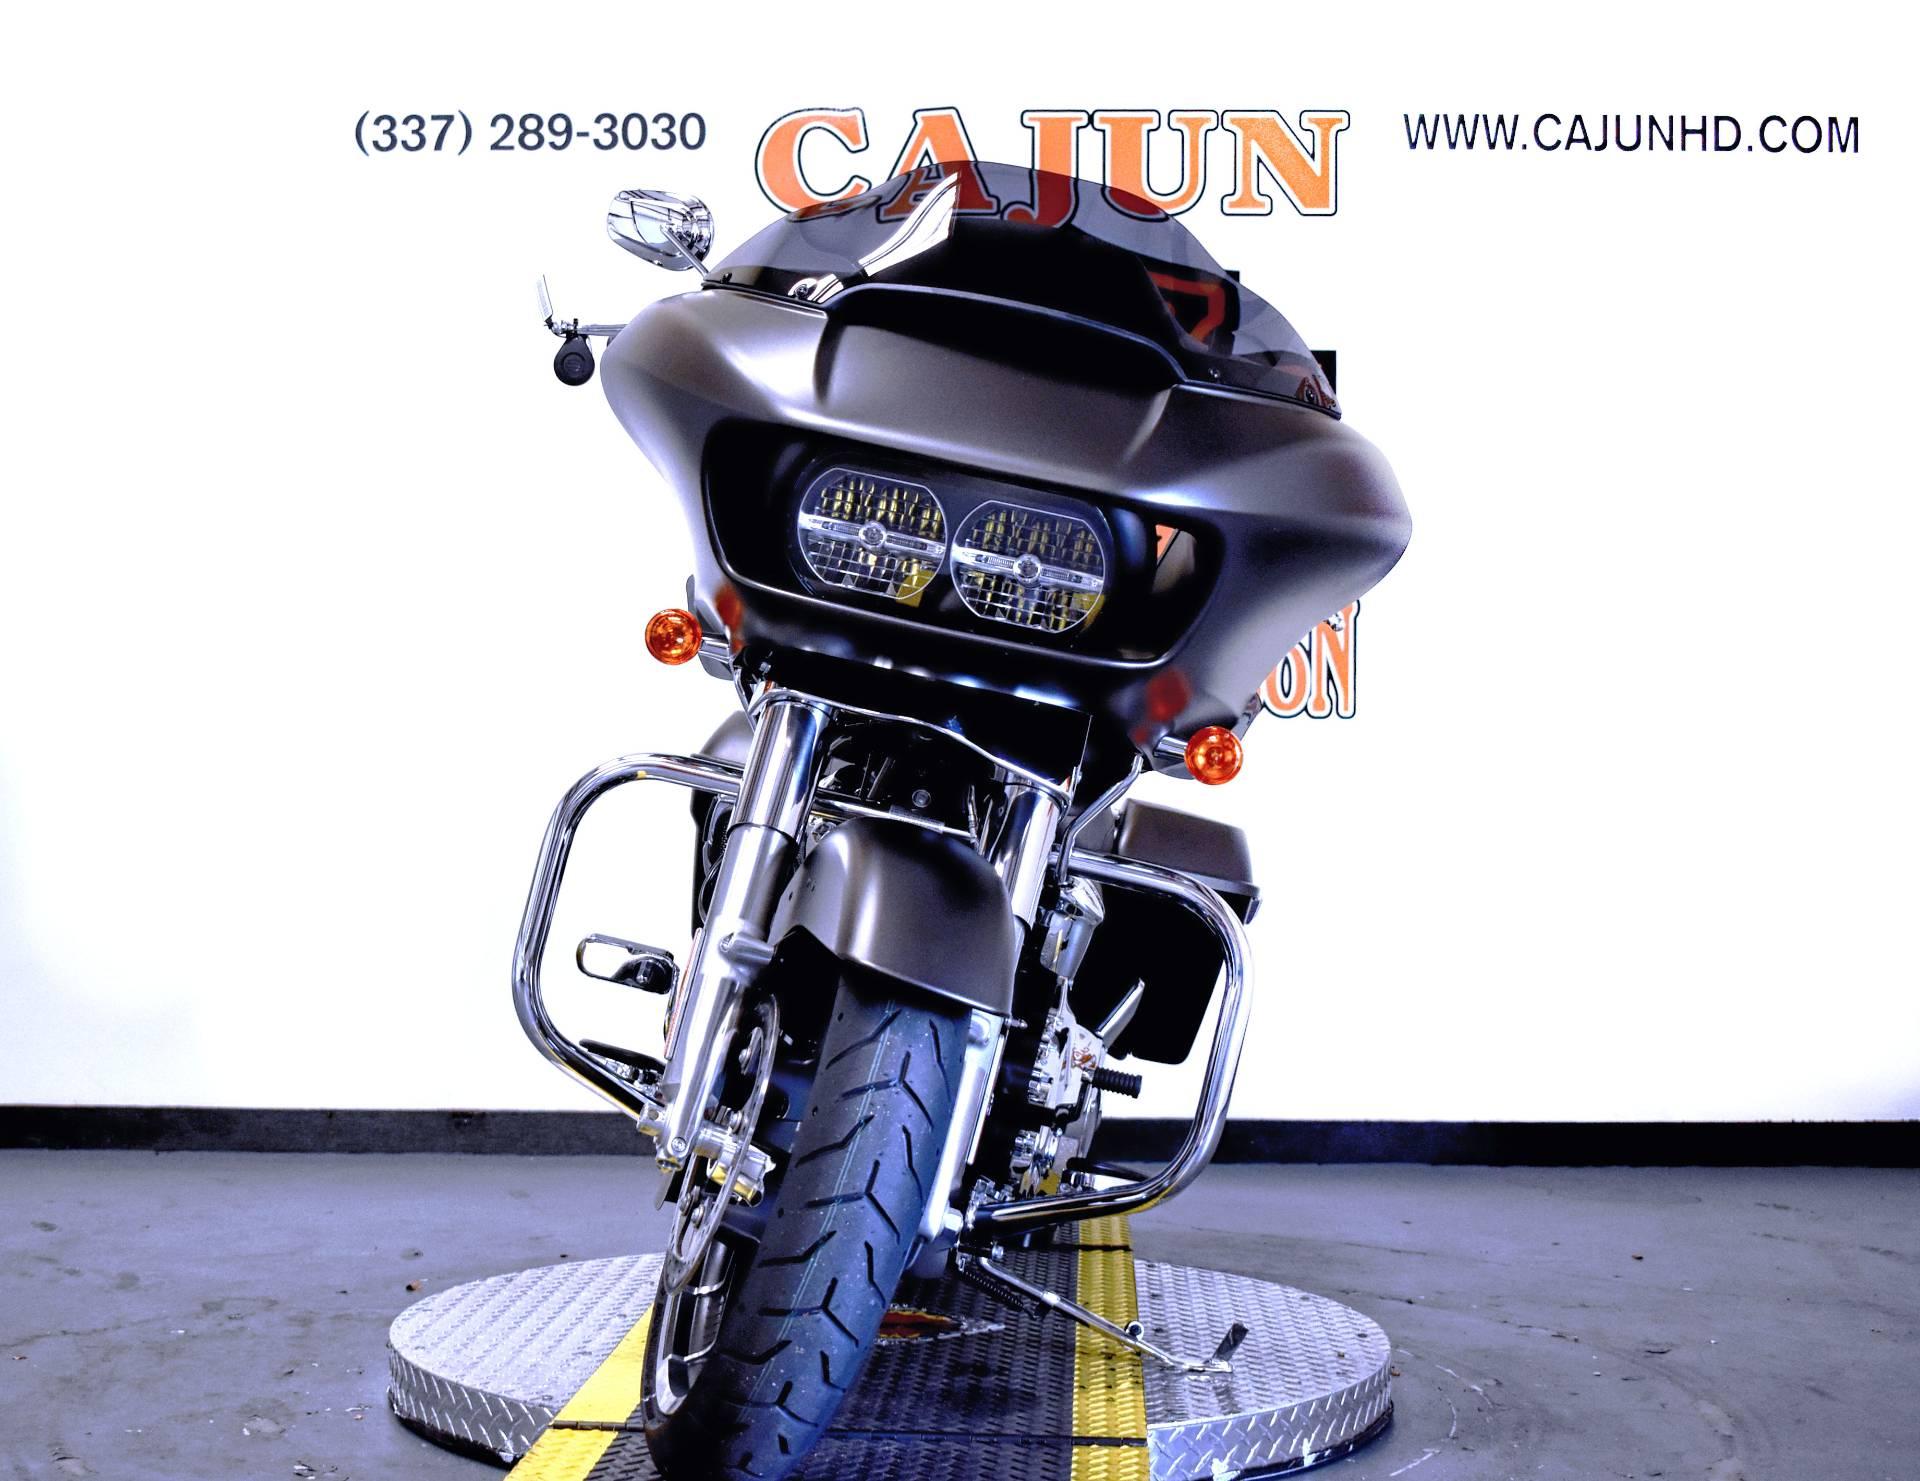 New 2020 Harley-Davidson Road Glide® | Motorcycles in Scott